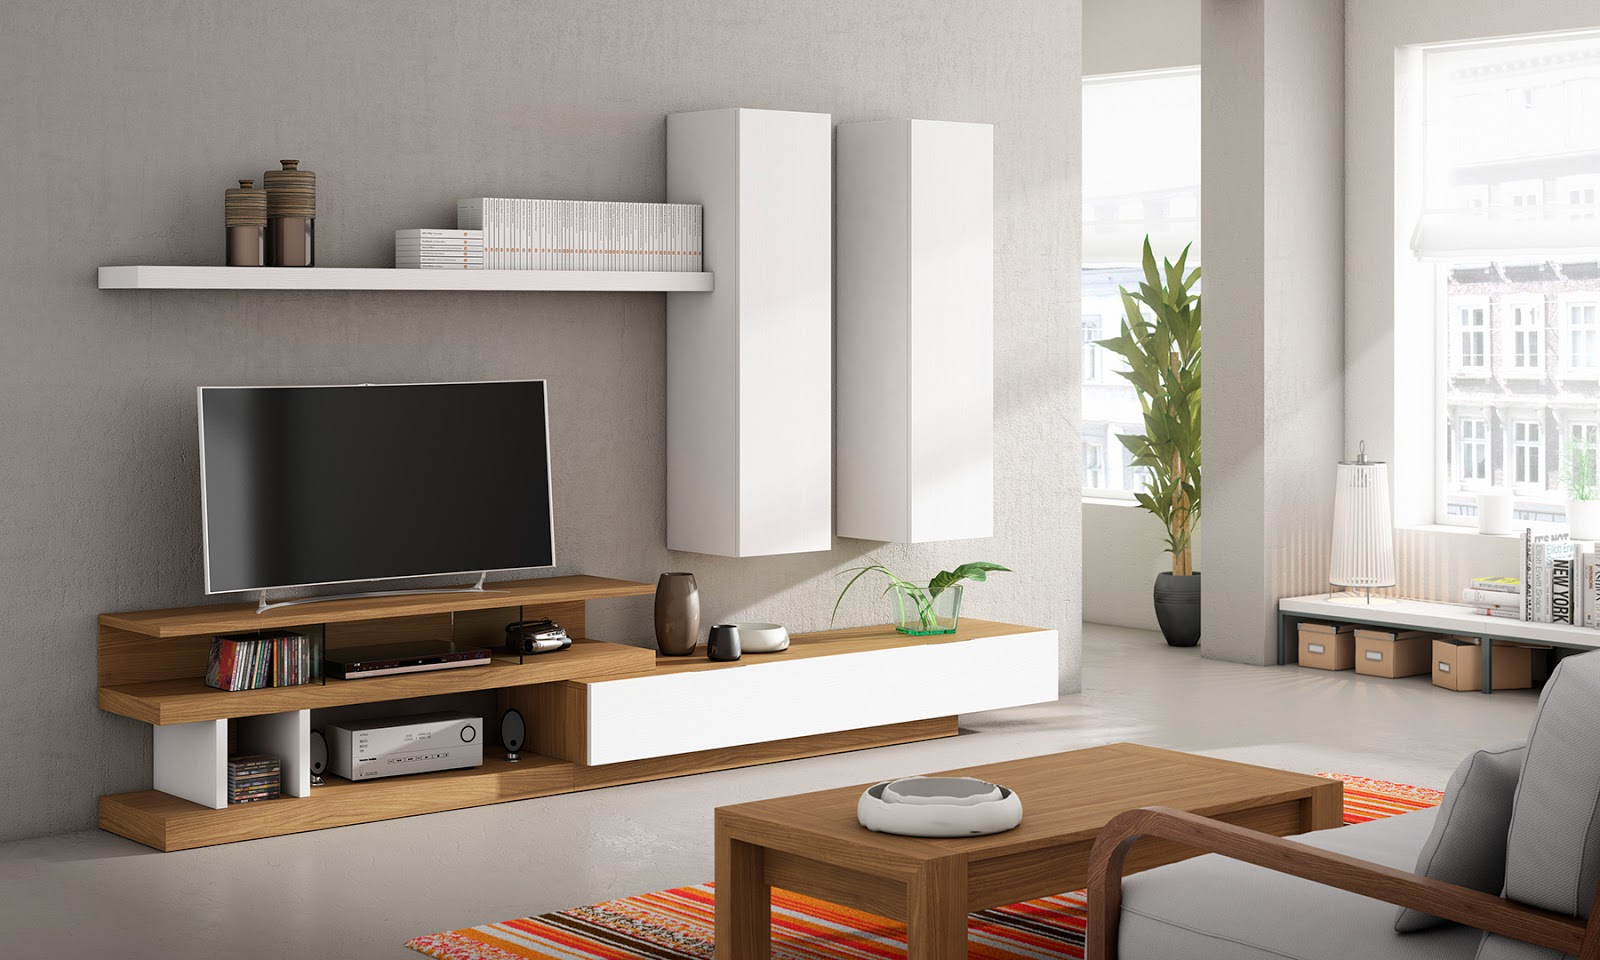 Armaris dormitoris salons taules mobles i fusteria jes s - Muebles de salon originales ...